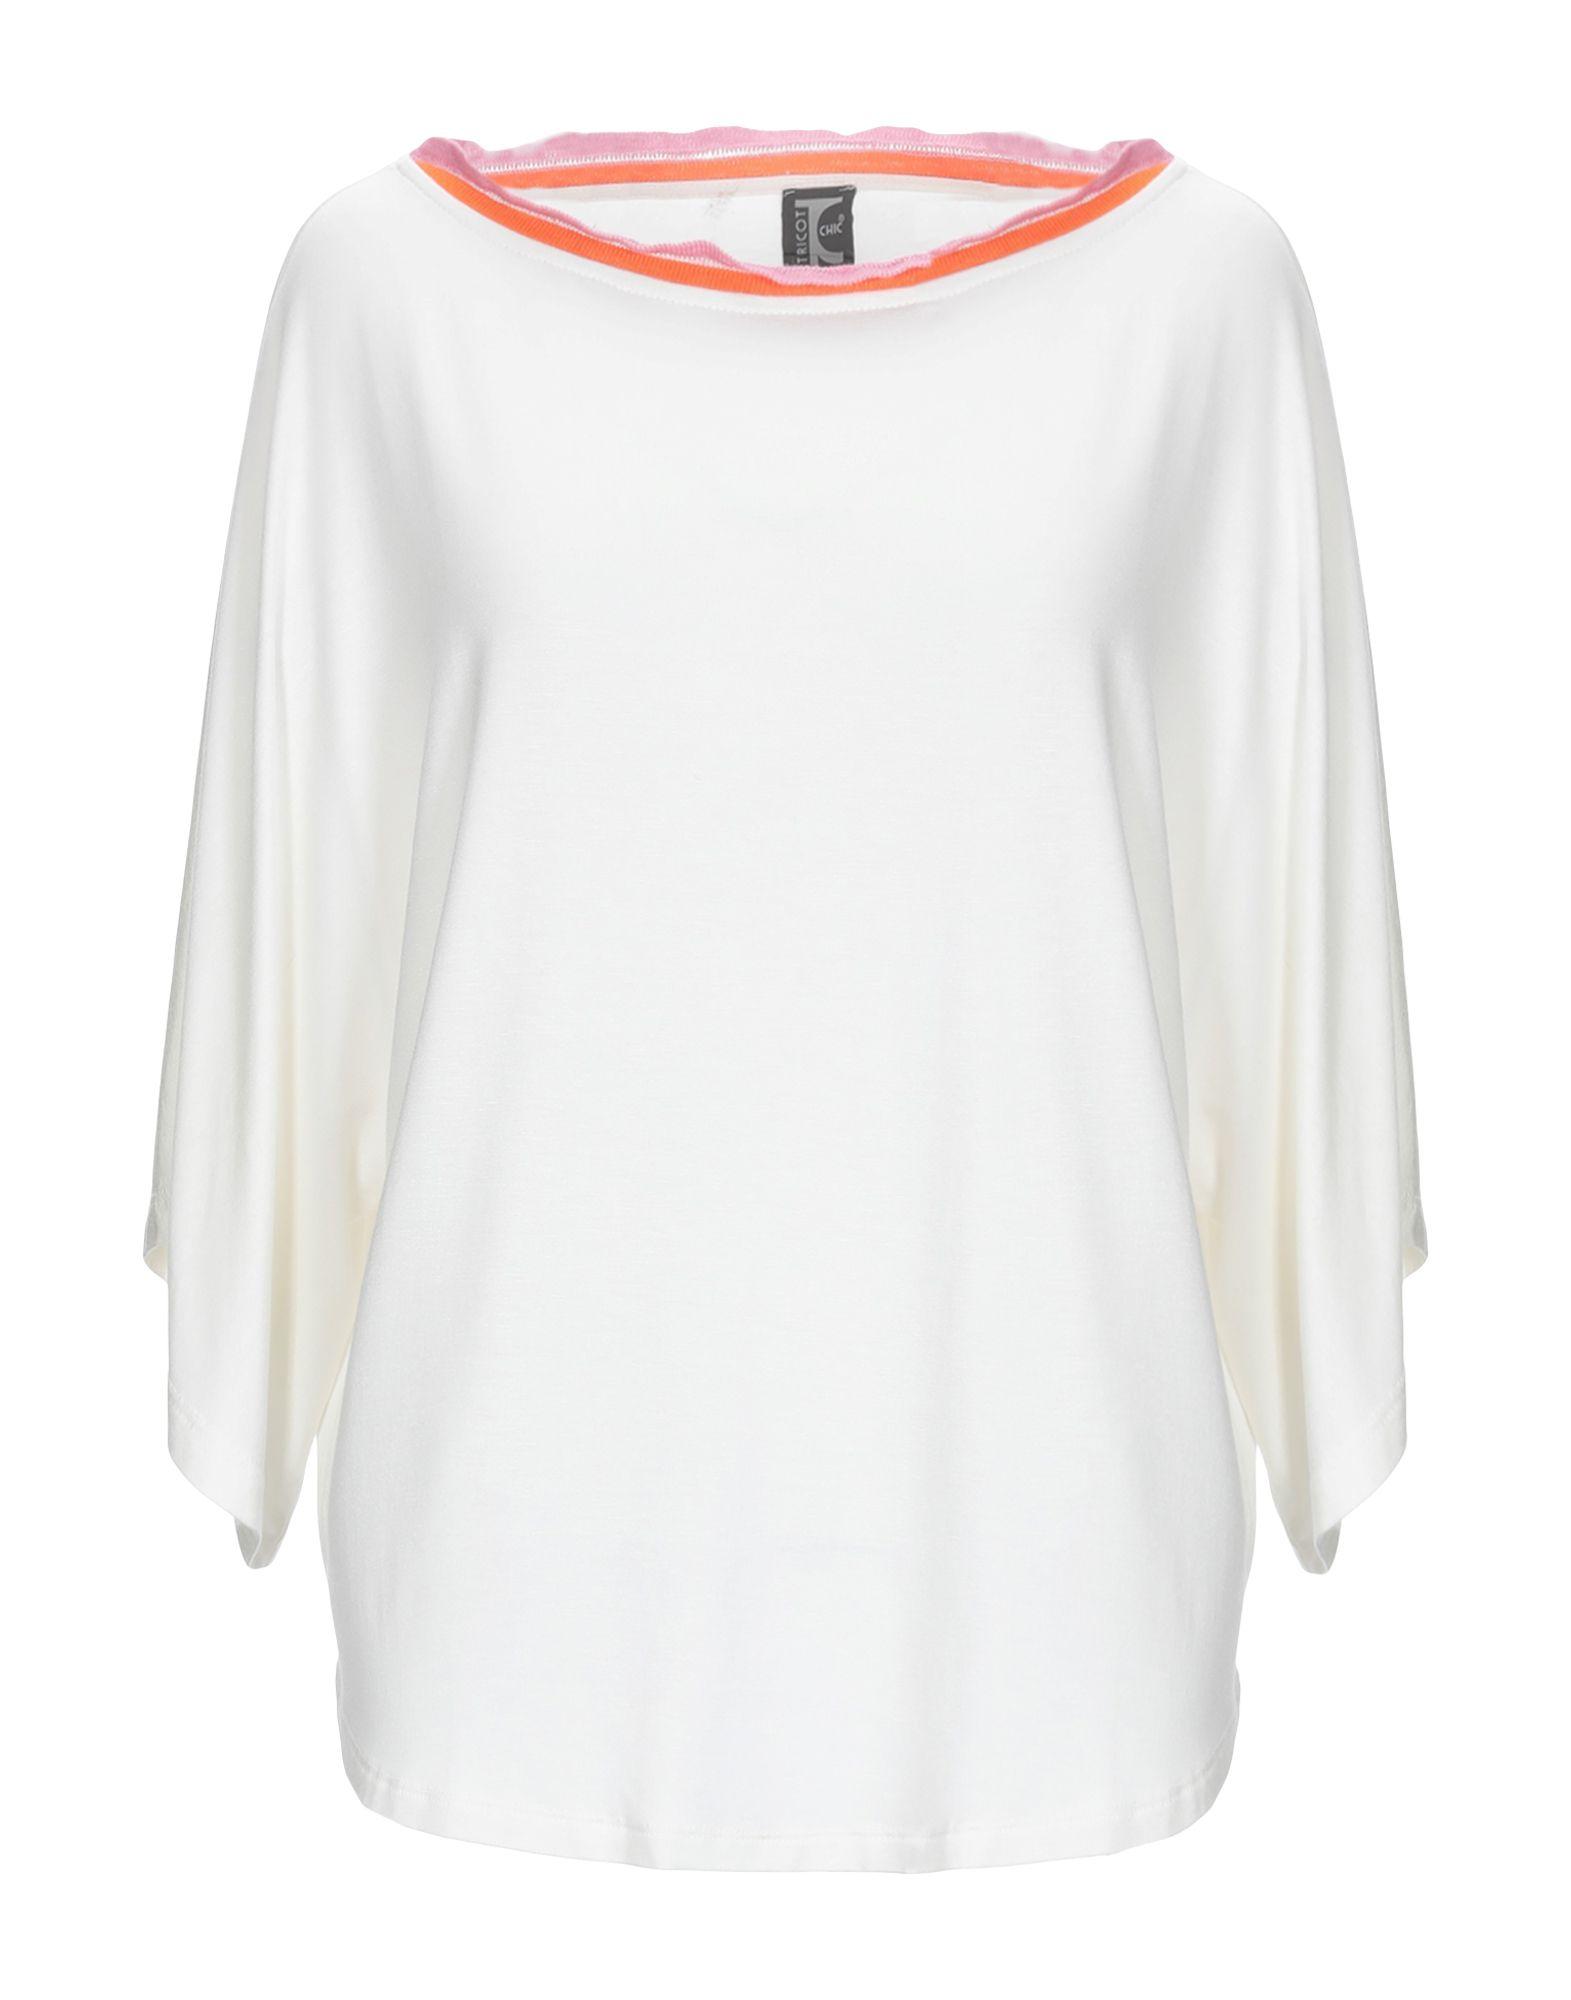 TRICOT CHIC Футболка платье tricot chic tricot chic tr023ewpub22